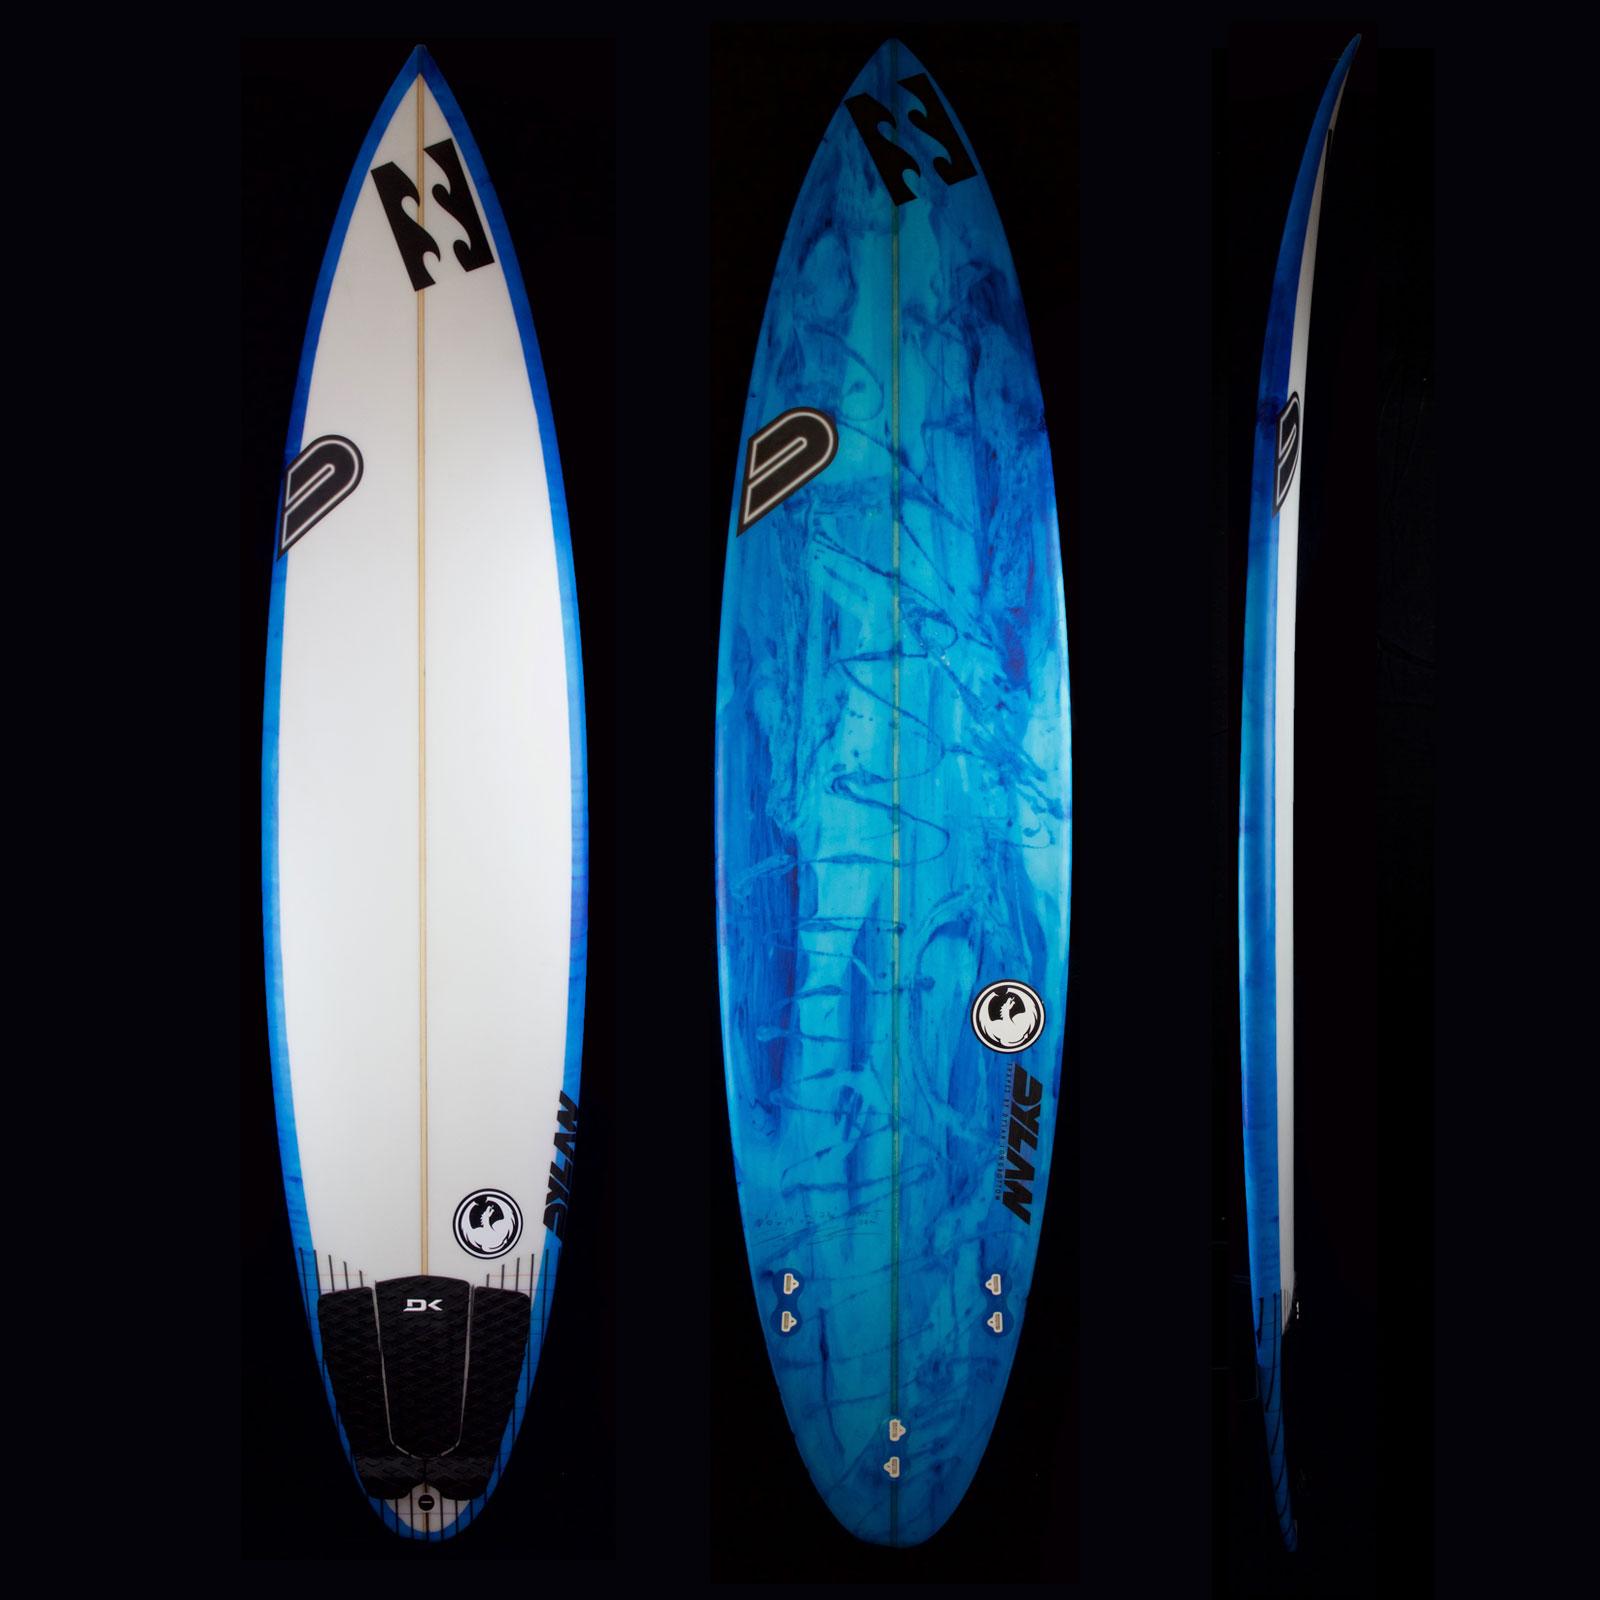 Big Gun Surfboard Sales Uk Suppliers Of Dylan Surfboards In Europe